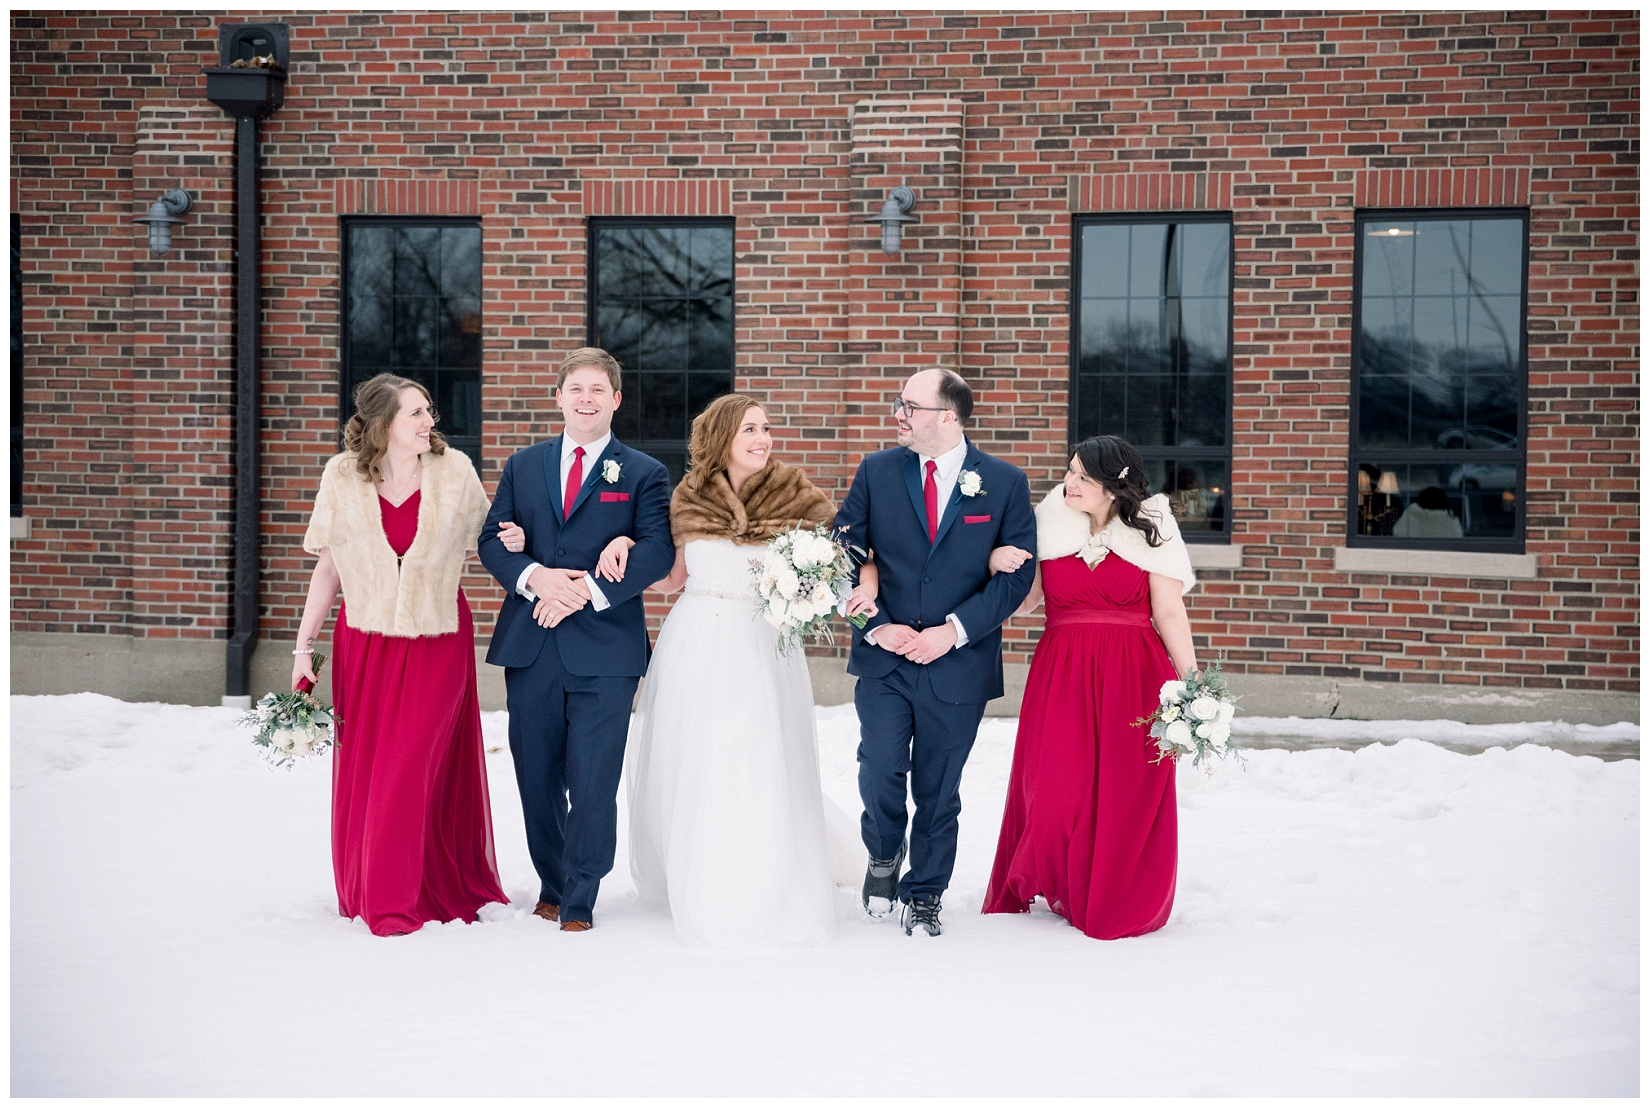 cat-alkire-wedding-photographer-indiana-chicago-indianapolis-fort-wayne_0957.jpg